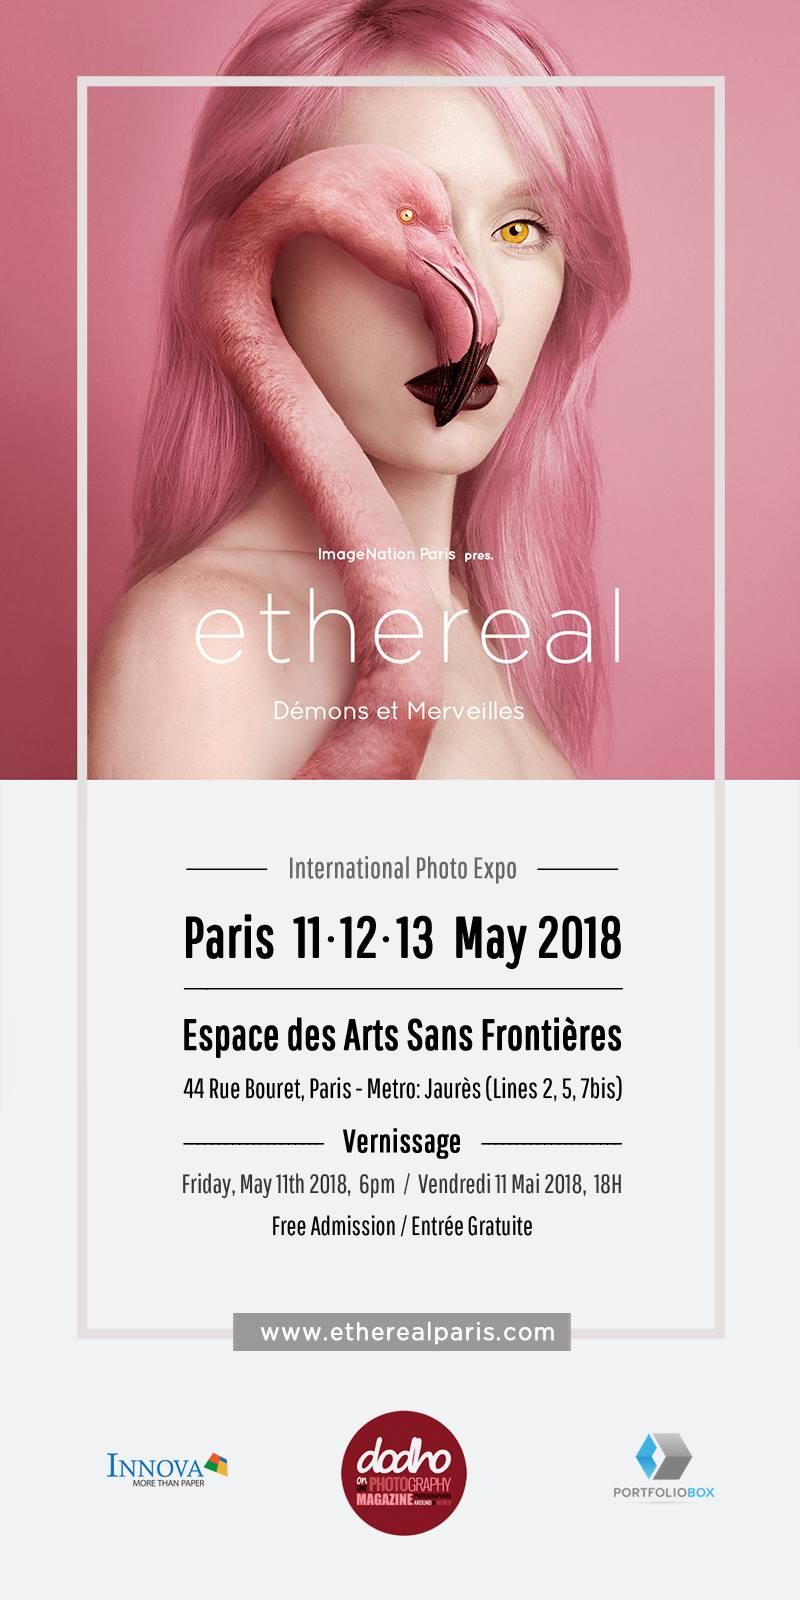 ethereal | Paris, France |  Demons et Merveilles | Alyssia Booth | International Photo Expo